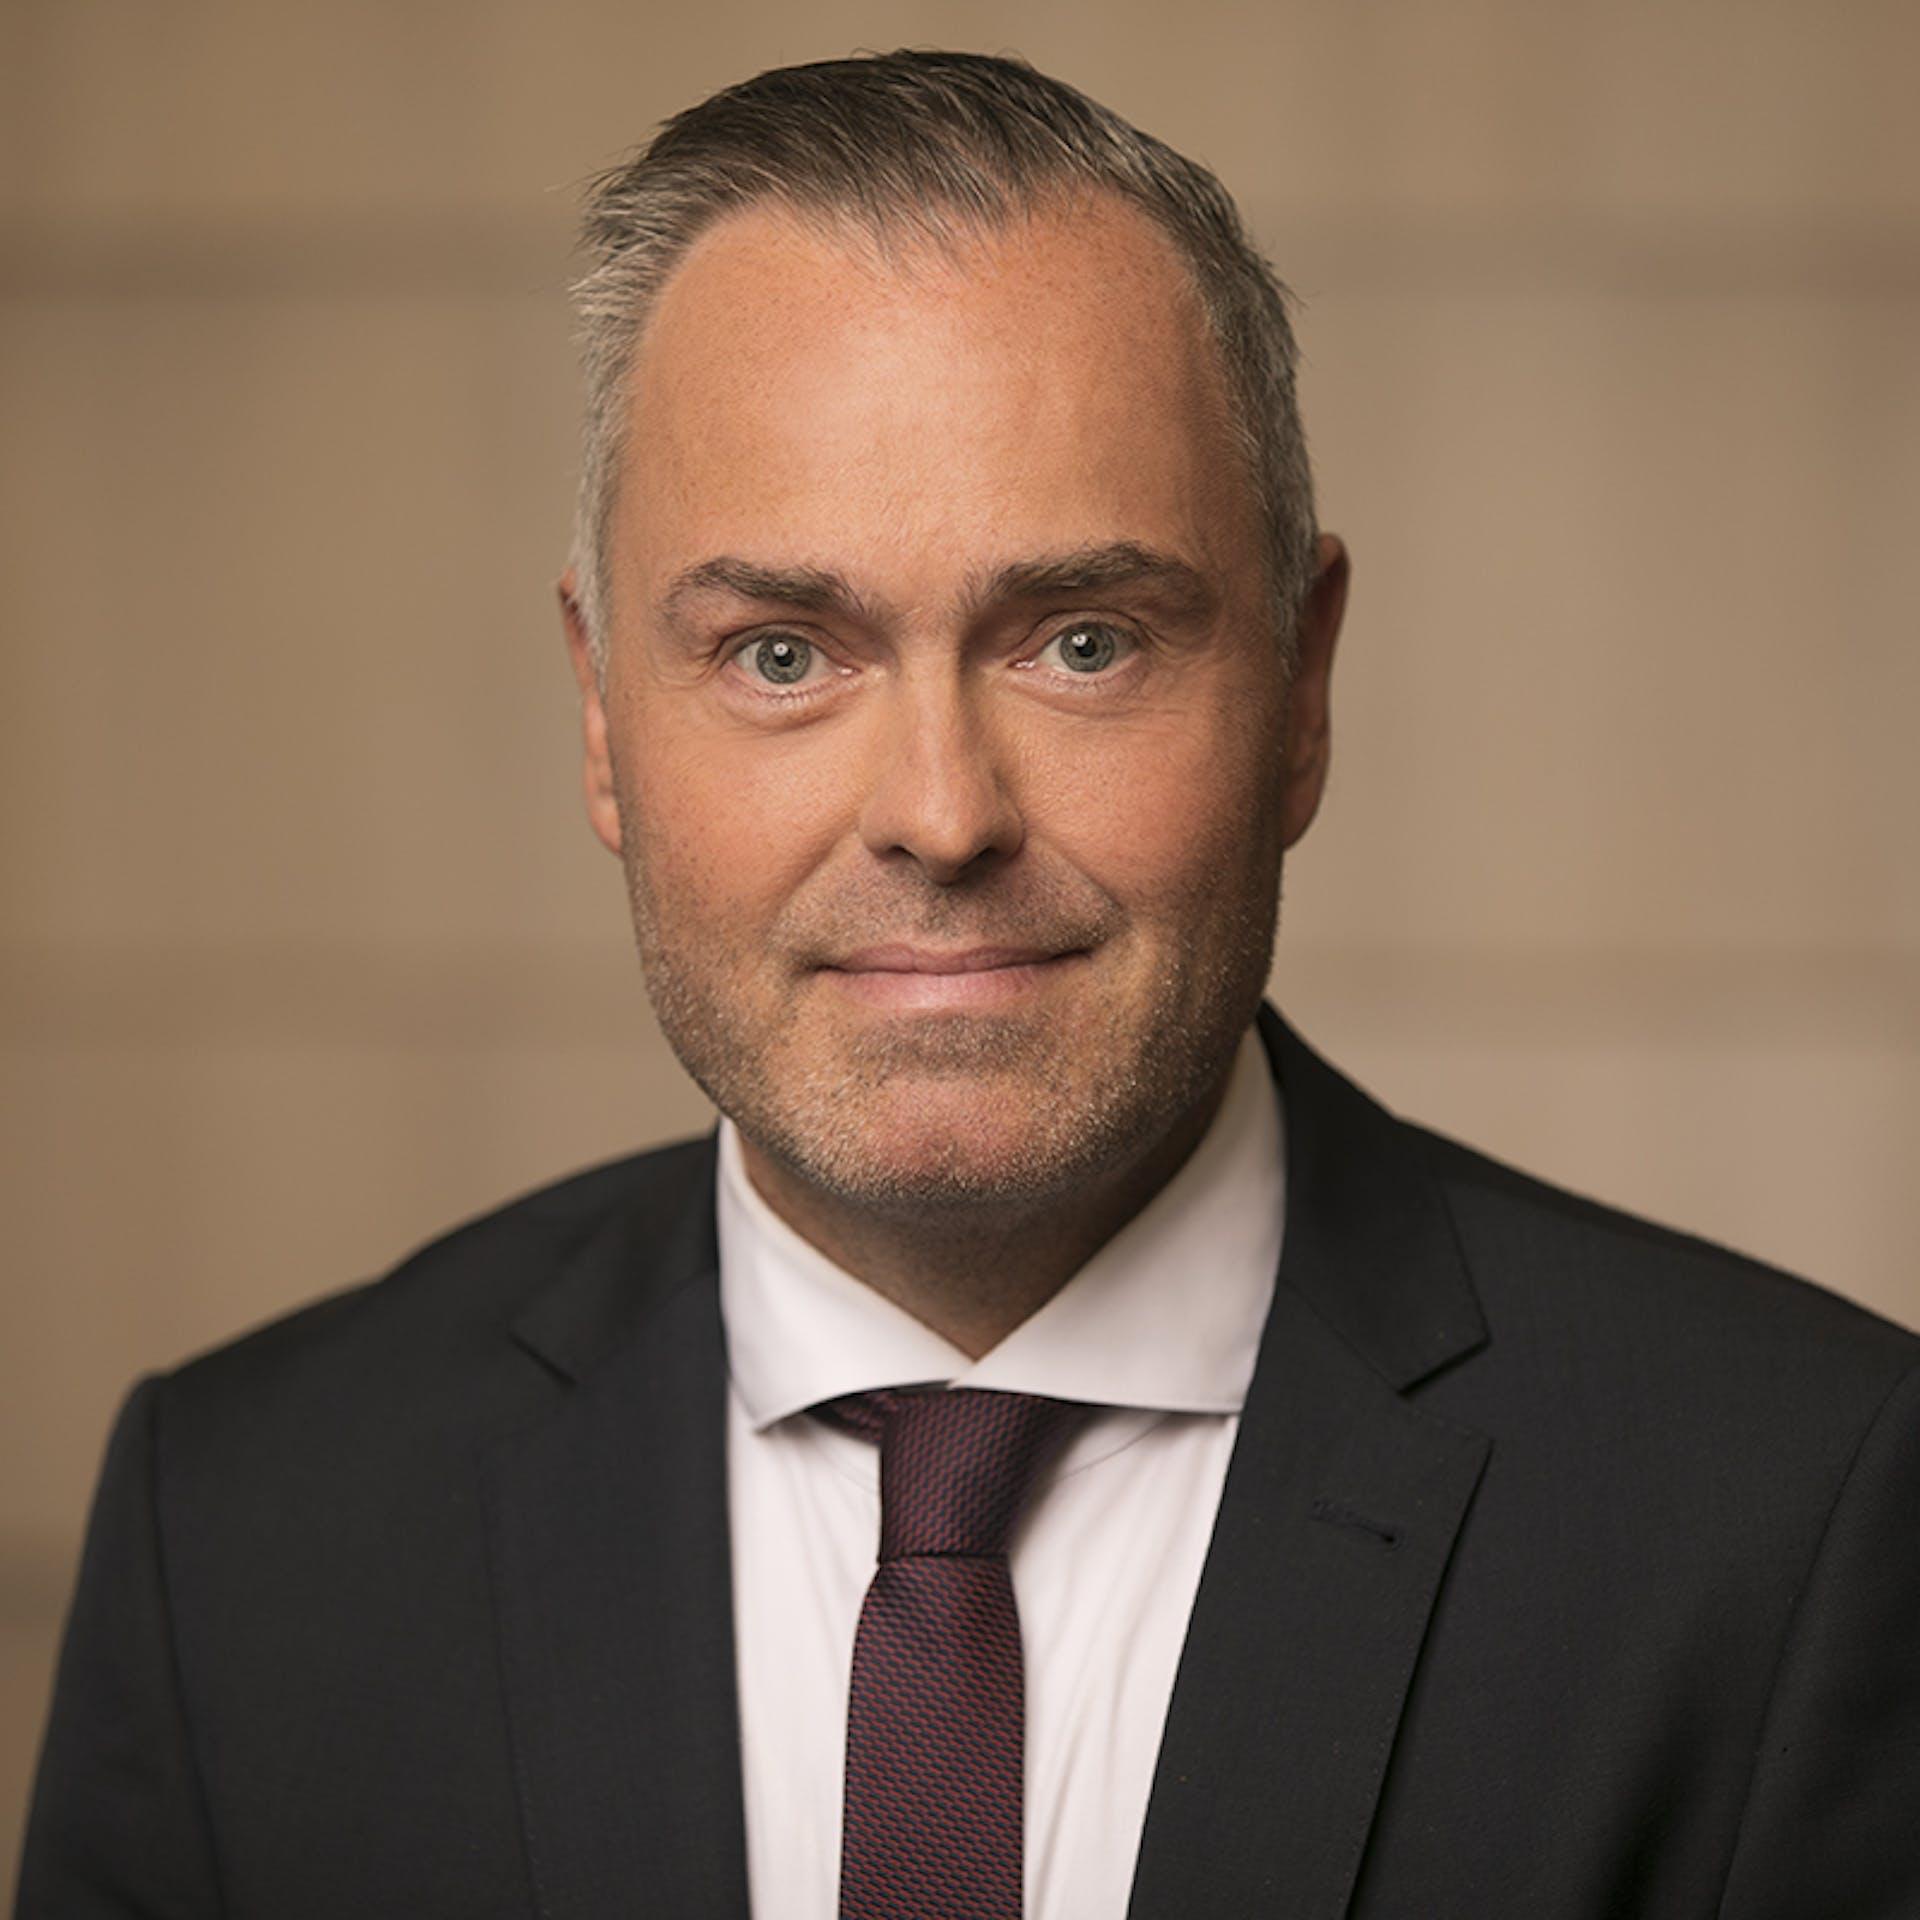 Valdimar A. Valdimarsson